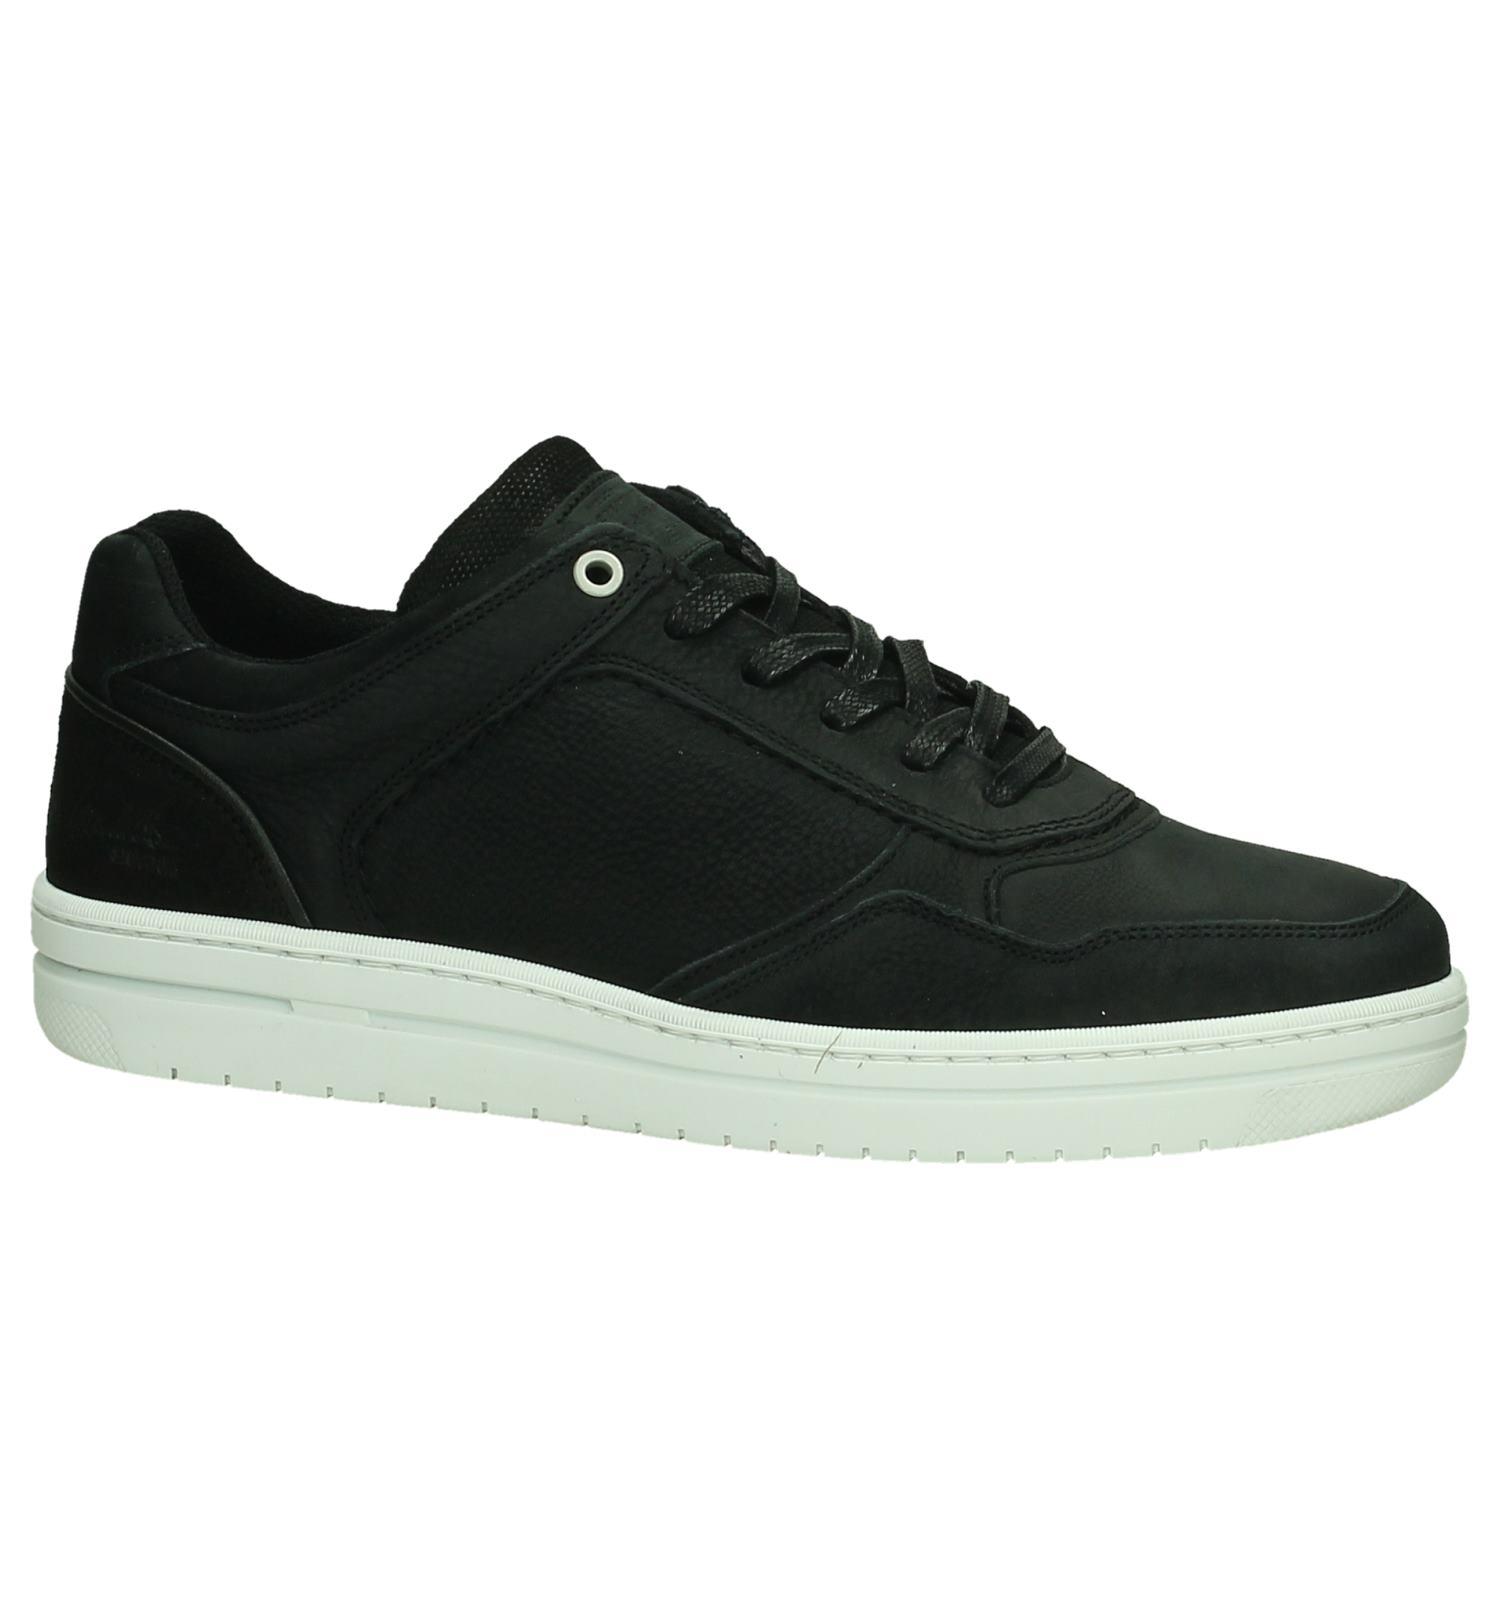 40b5744fdbc Bullboxer Chaussures basses (Noir)